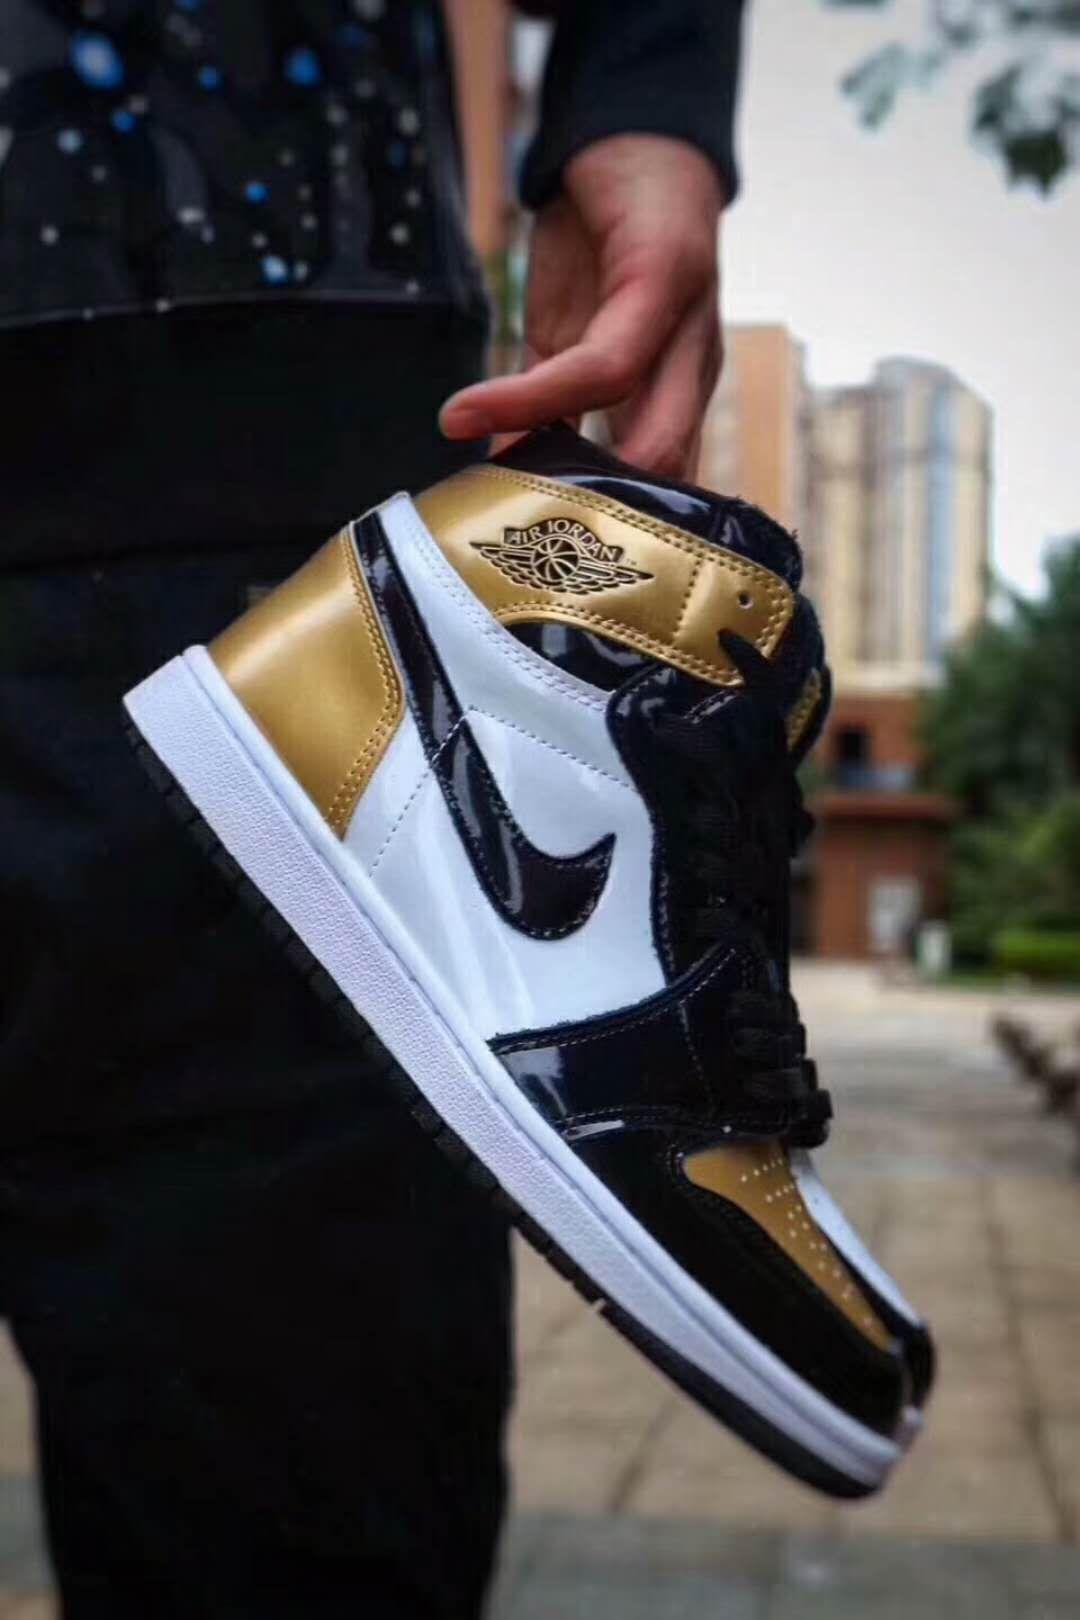 Air Jordan 1 Retro High Og Gold Top 3 861428 001 With Images